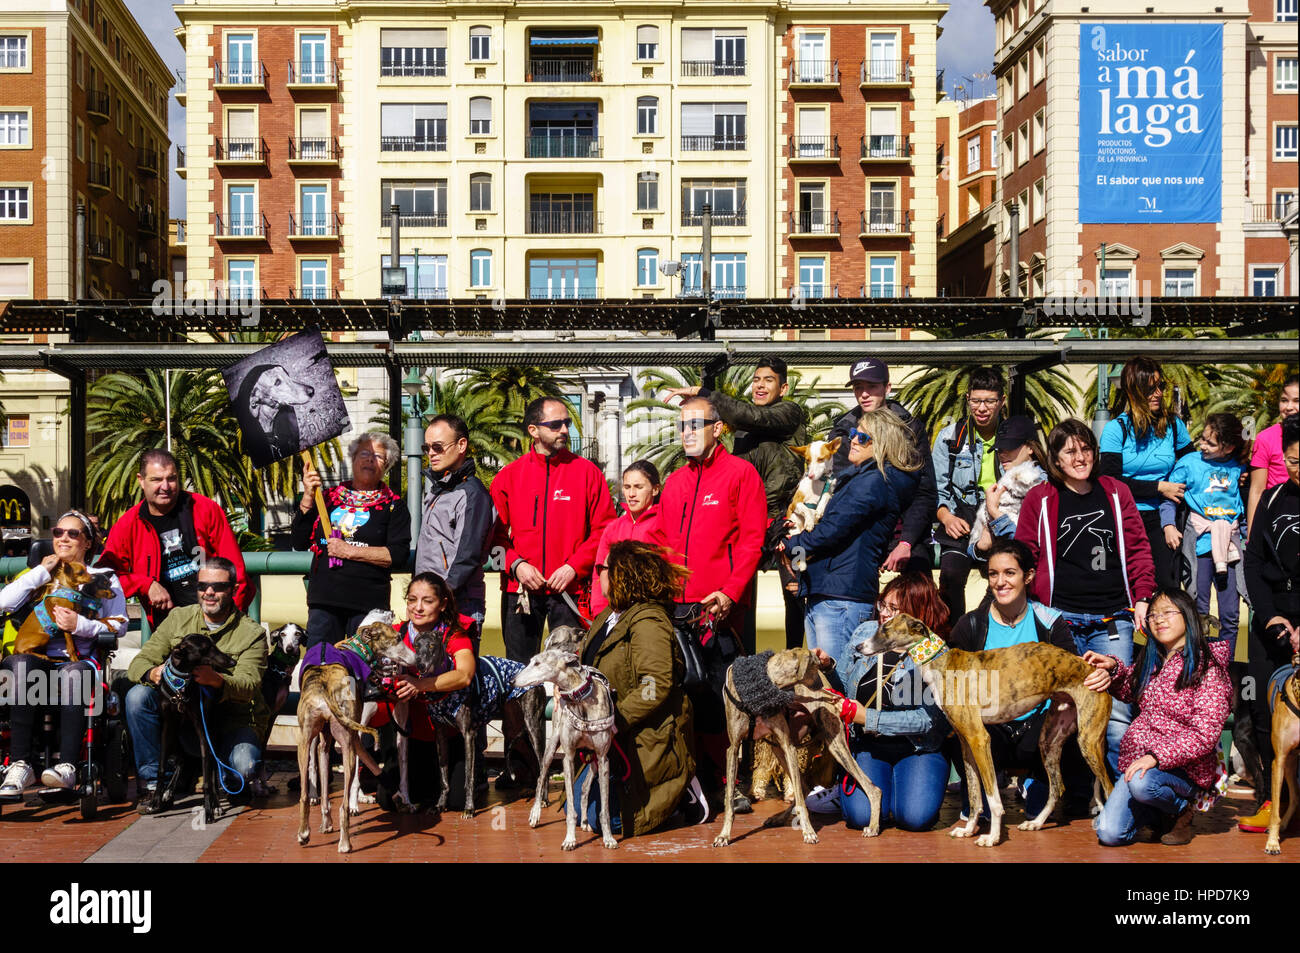 Levriero protesta Galgos Espanol Galgos Español a Malaga, Spagna. 05 Febbraio 2017 Immagini Stock